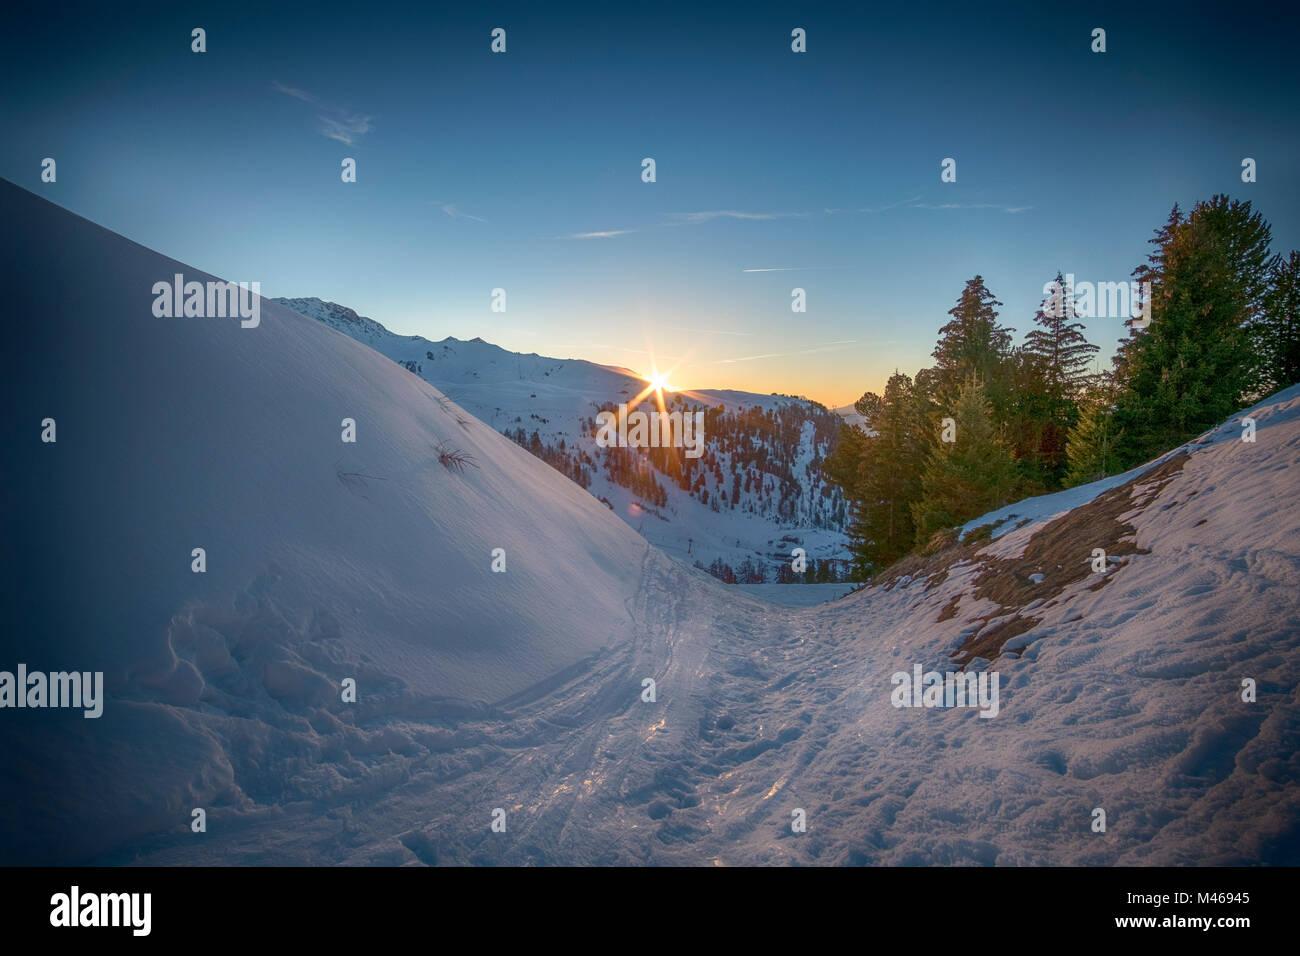 Winter sunset landscape at Belle Plagne ski resort in La Plagne, Savoie, France. Credit: Malcolm Park/Alamy. - Stock Image